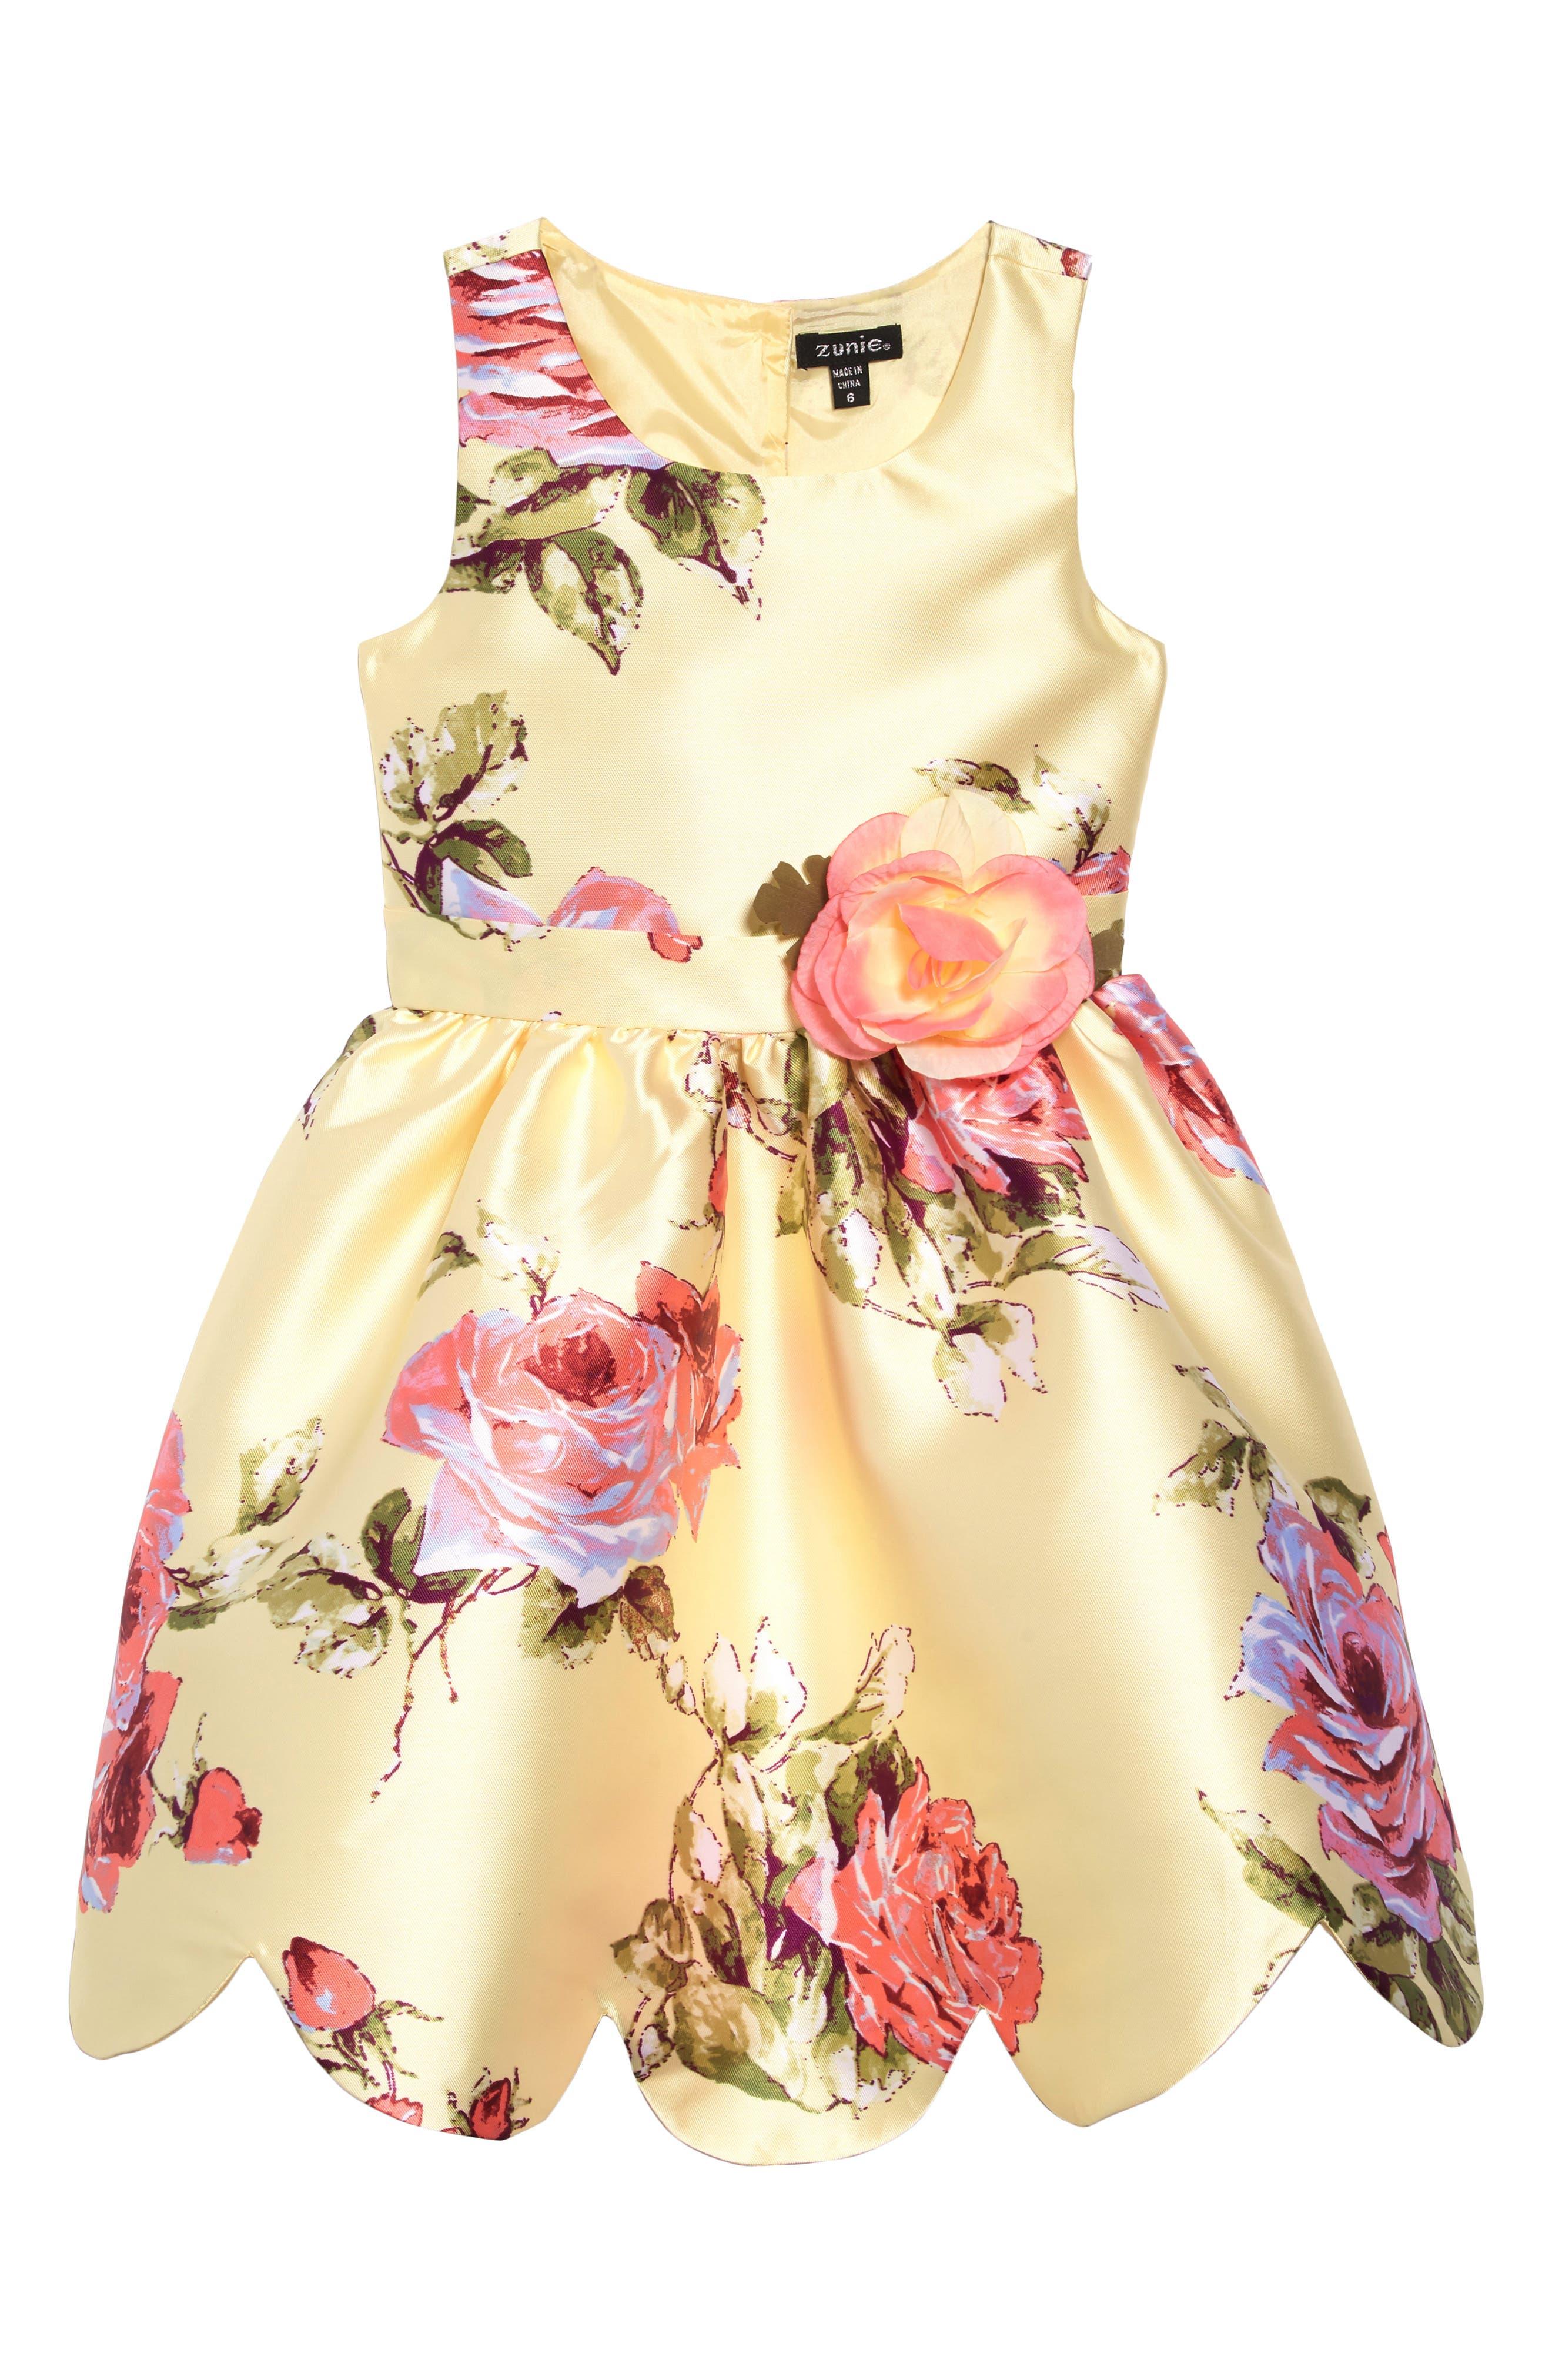 ZUNIE, Floral Print Scalloped Hem Dress, Main thumbnail 1, color, YELLOW FLORAL